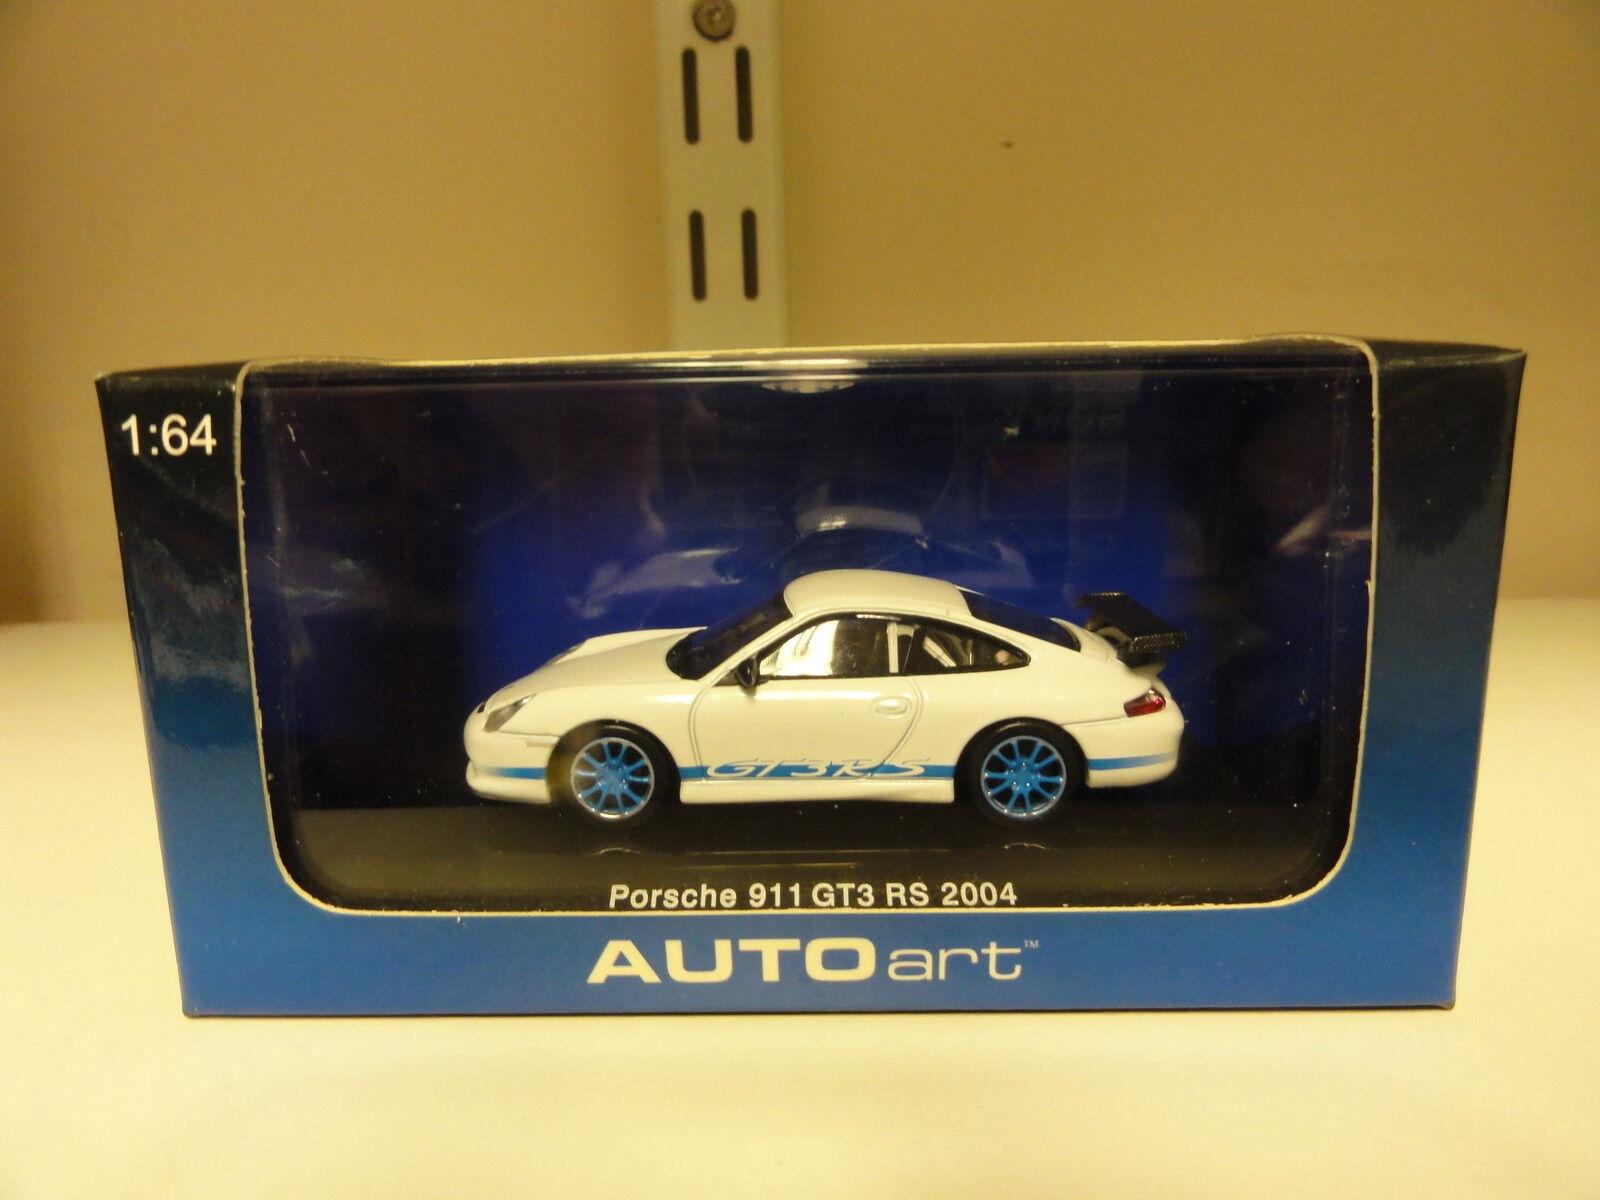 Autoart 1 64 Porsche 911 GT3 RS 2004 bluee White